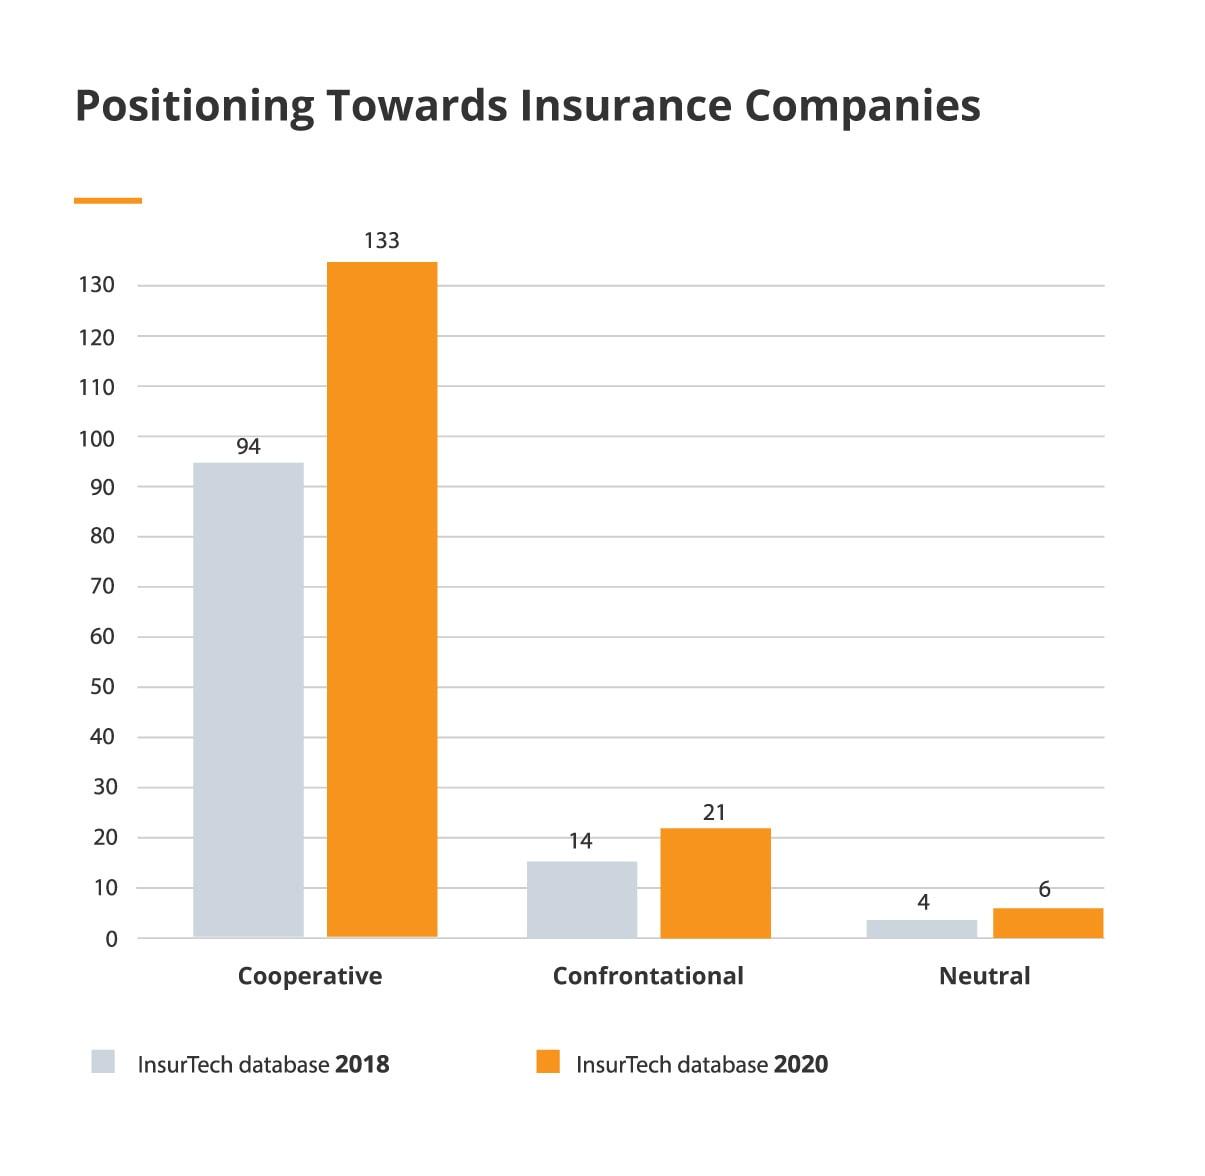 Positioning_Towards_Insurance_Companies